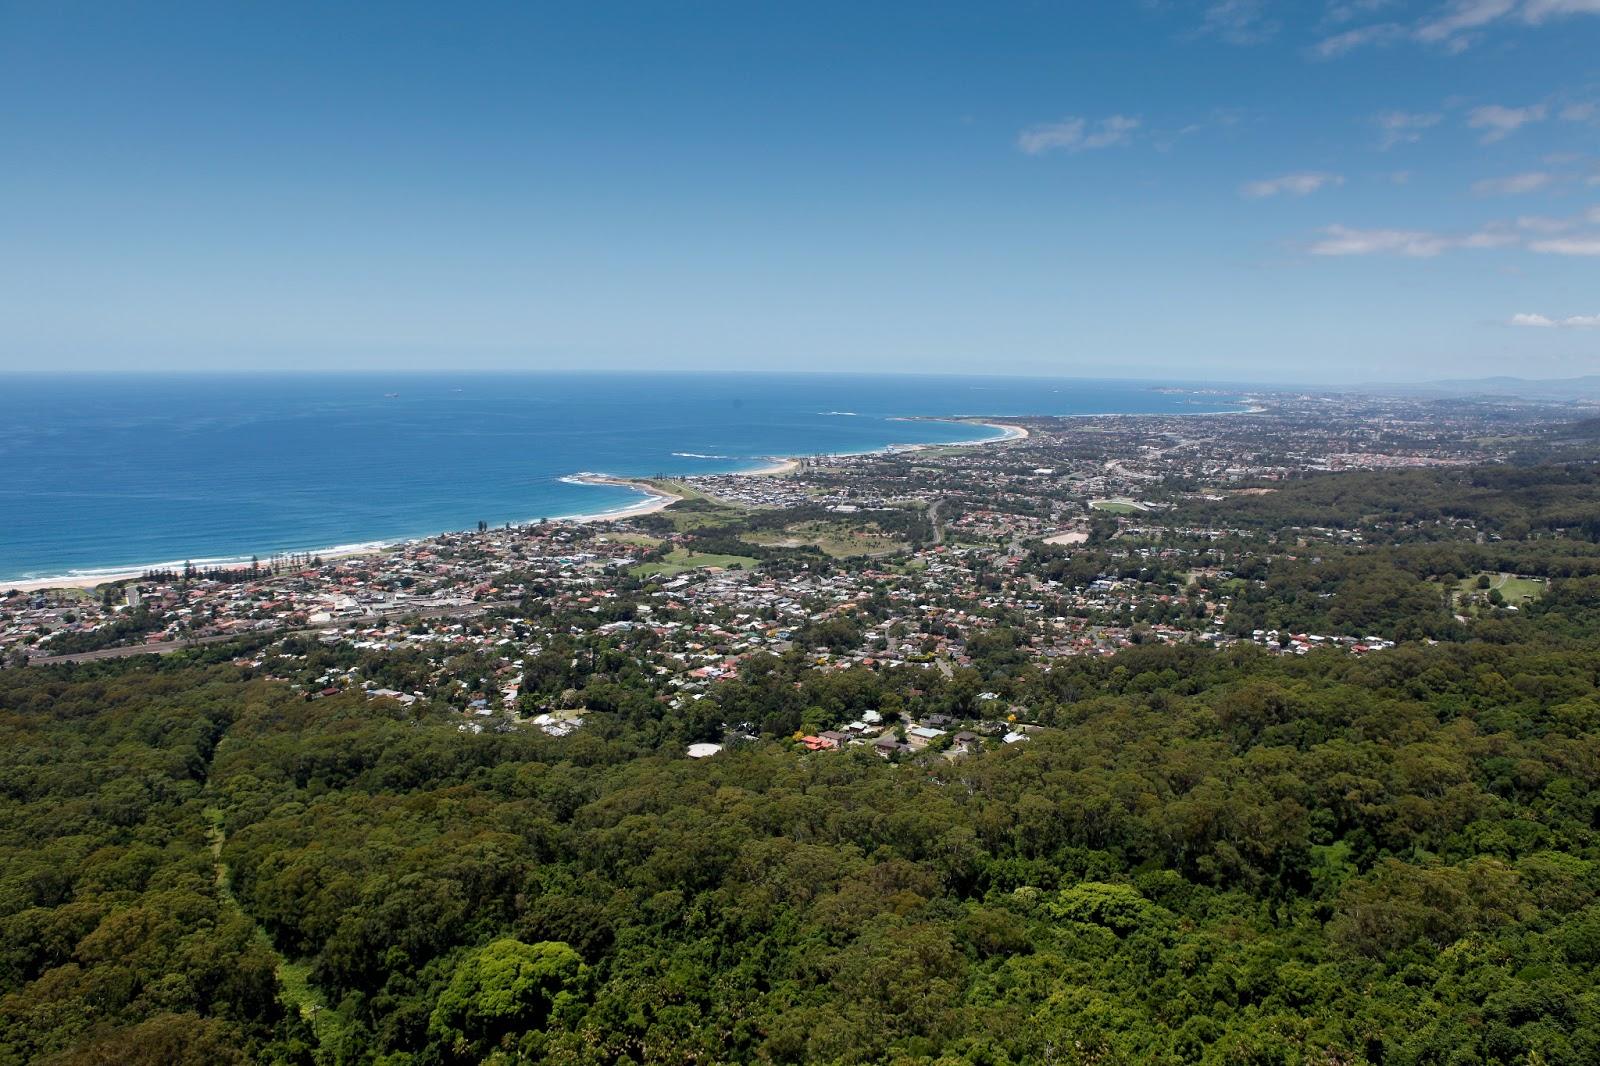 wollongong new south wales australia - photo#24